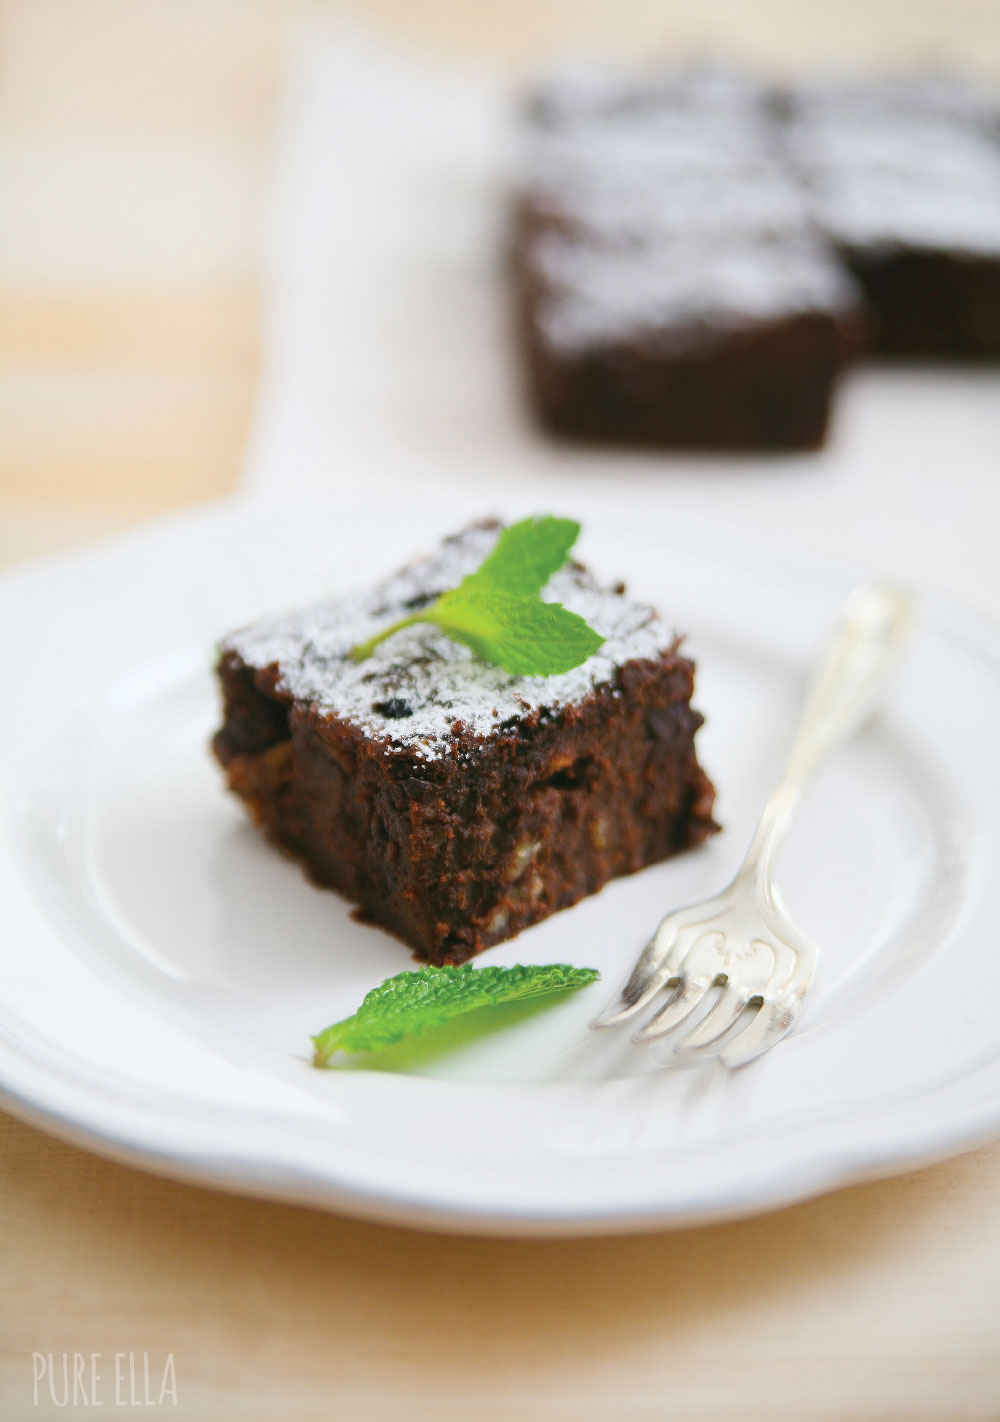 Pure-Ella-Guilt-free-Chocolate-Sweet-Potato-Brownies7